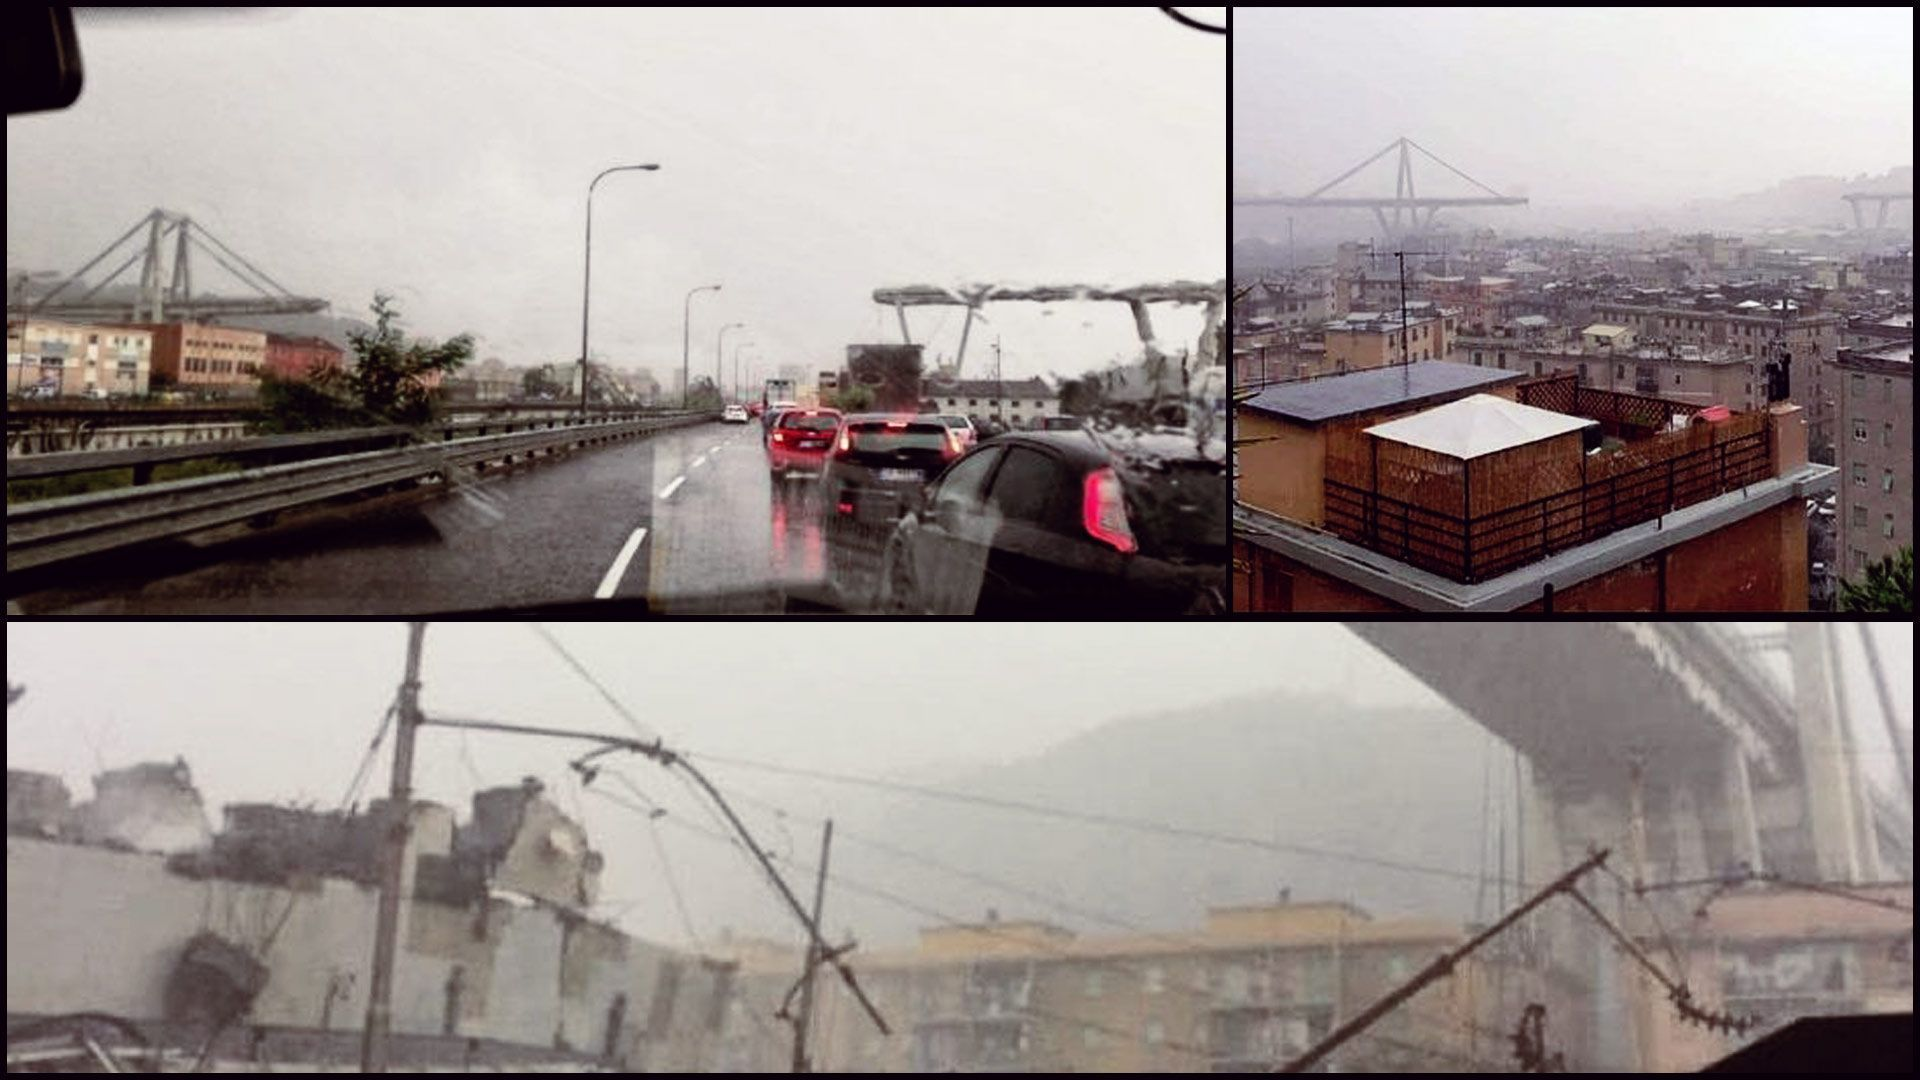 Срути се мост на италианска магистрала, има десетки ранени и жертви (видео)